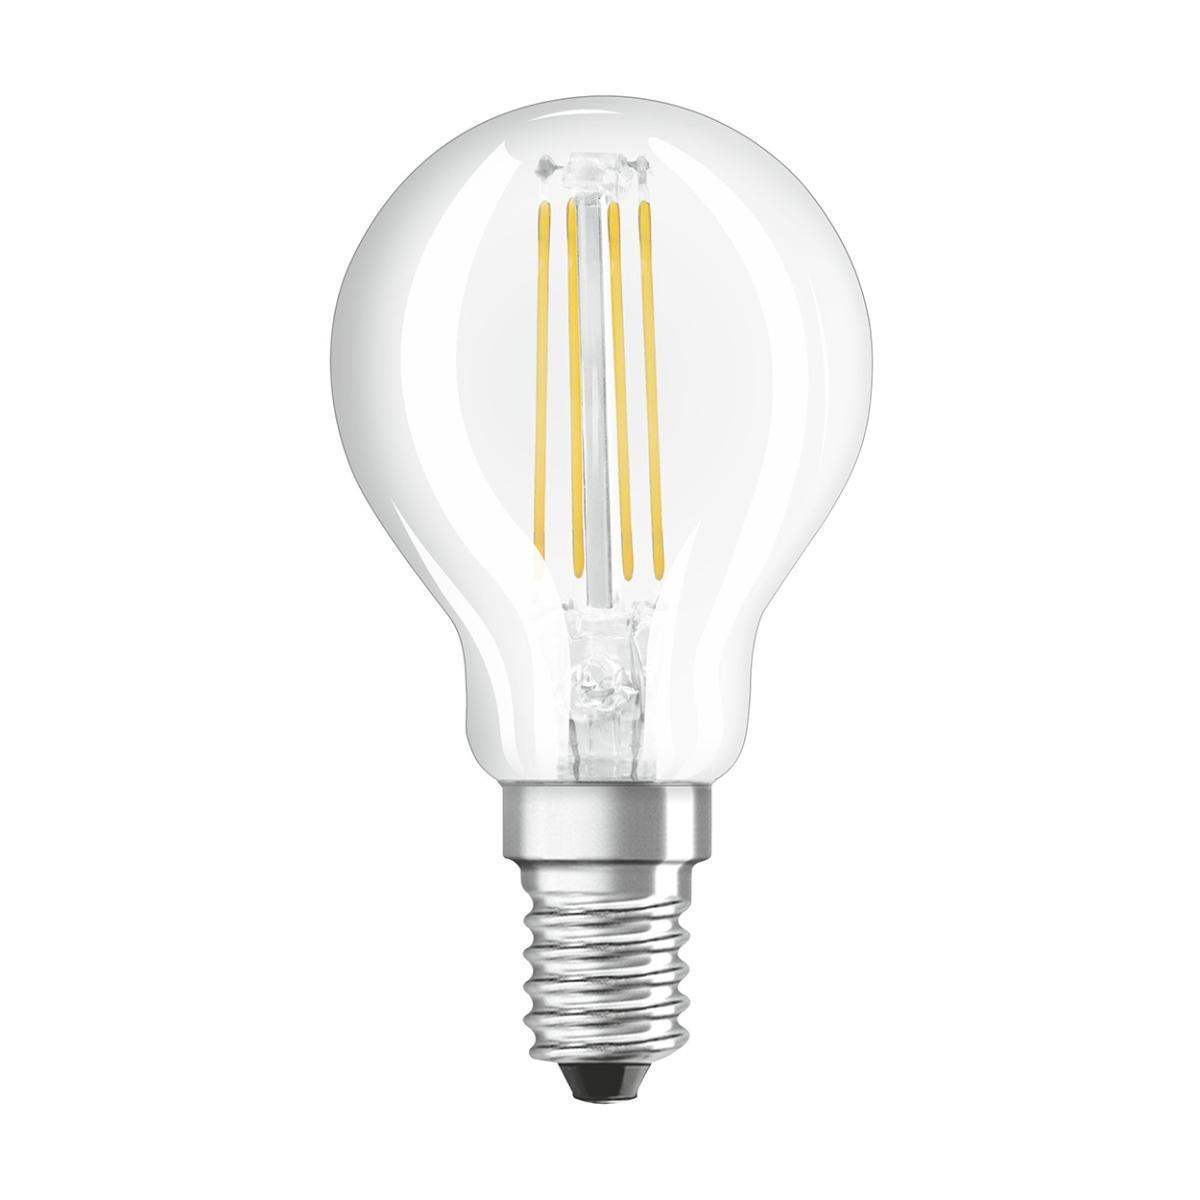 LED žárovka LED E14 Koule 4W = 40W 470lm 2700K 3-STEP OSRAM STAR OSRSTA7115